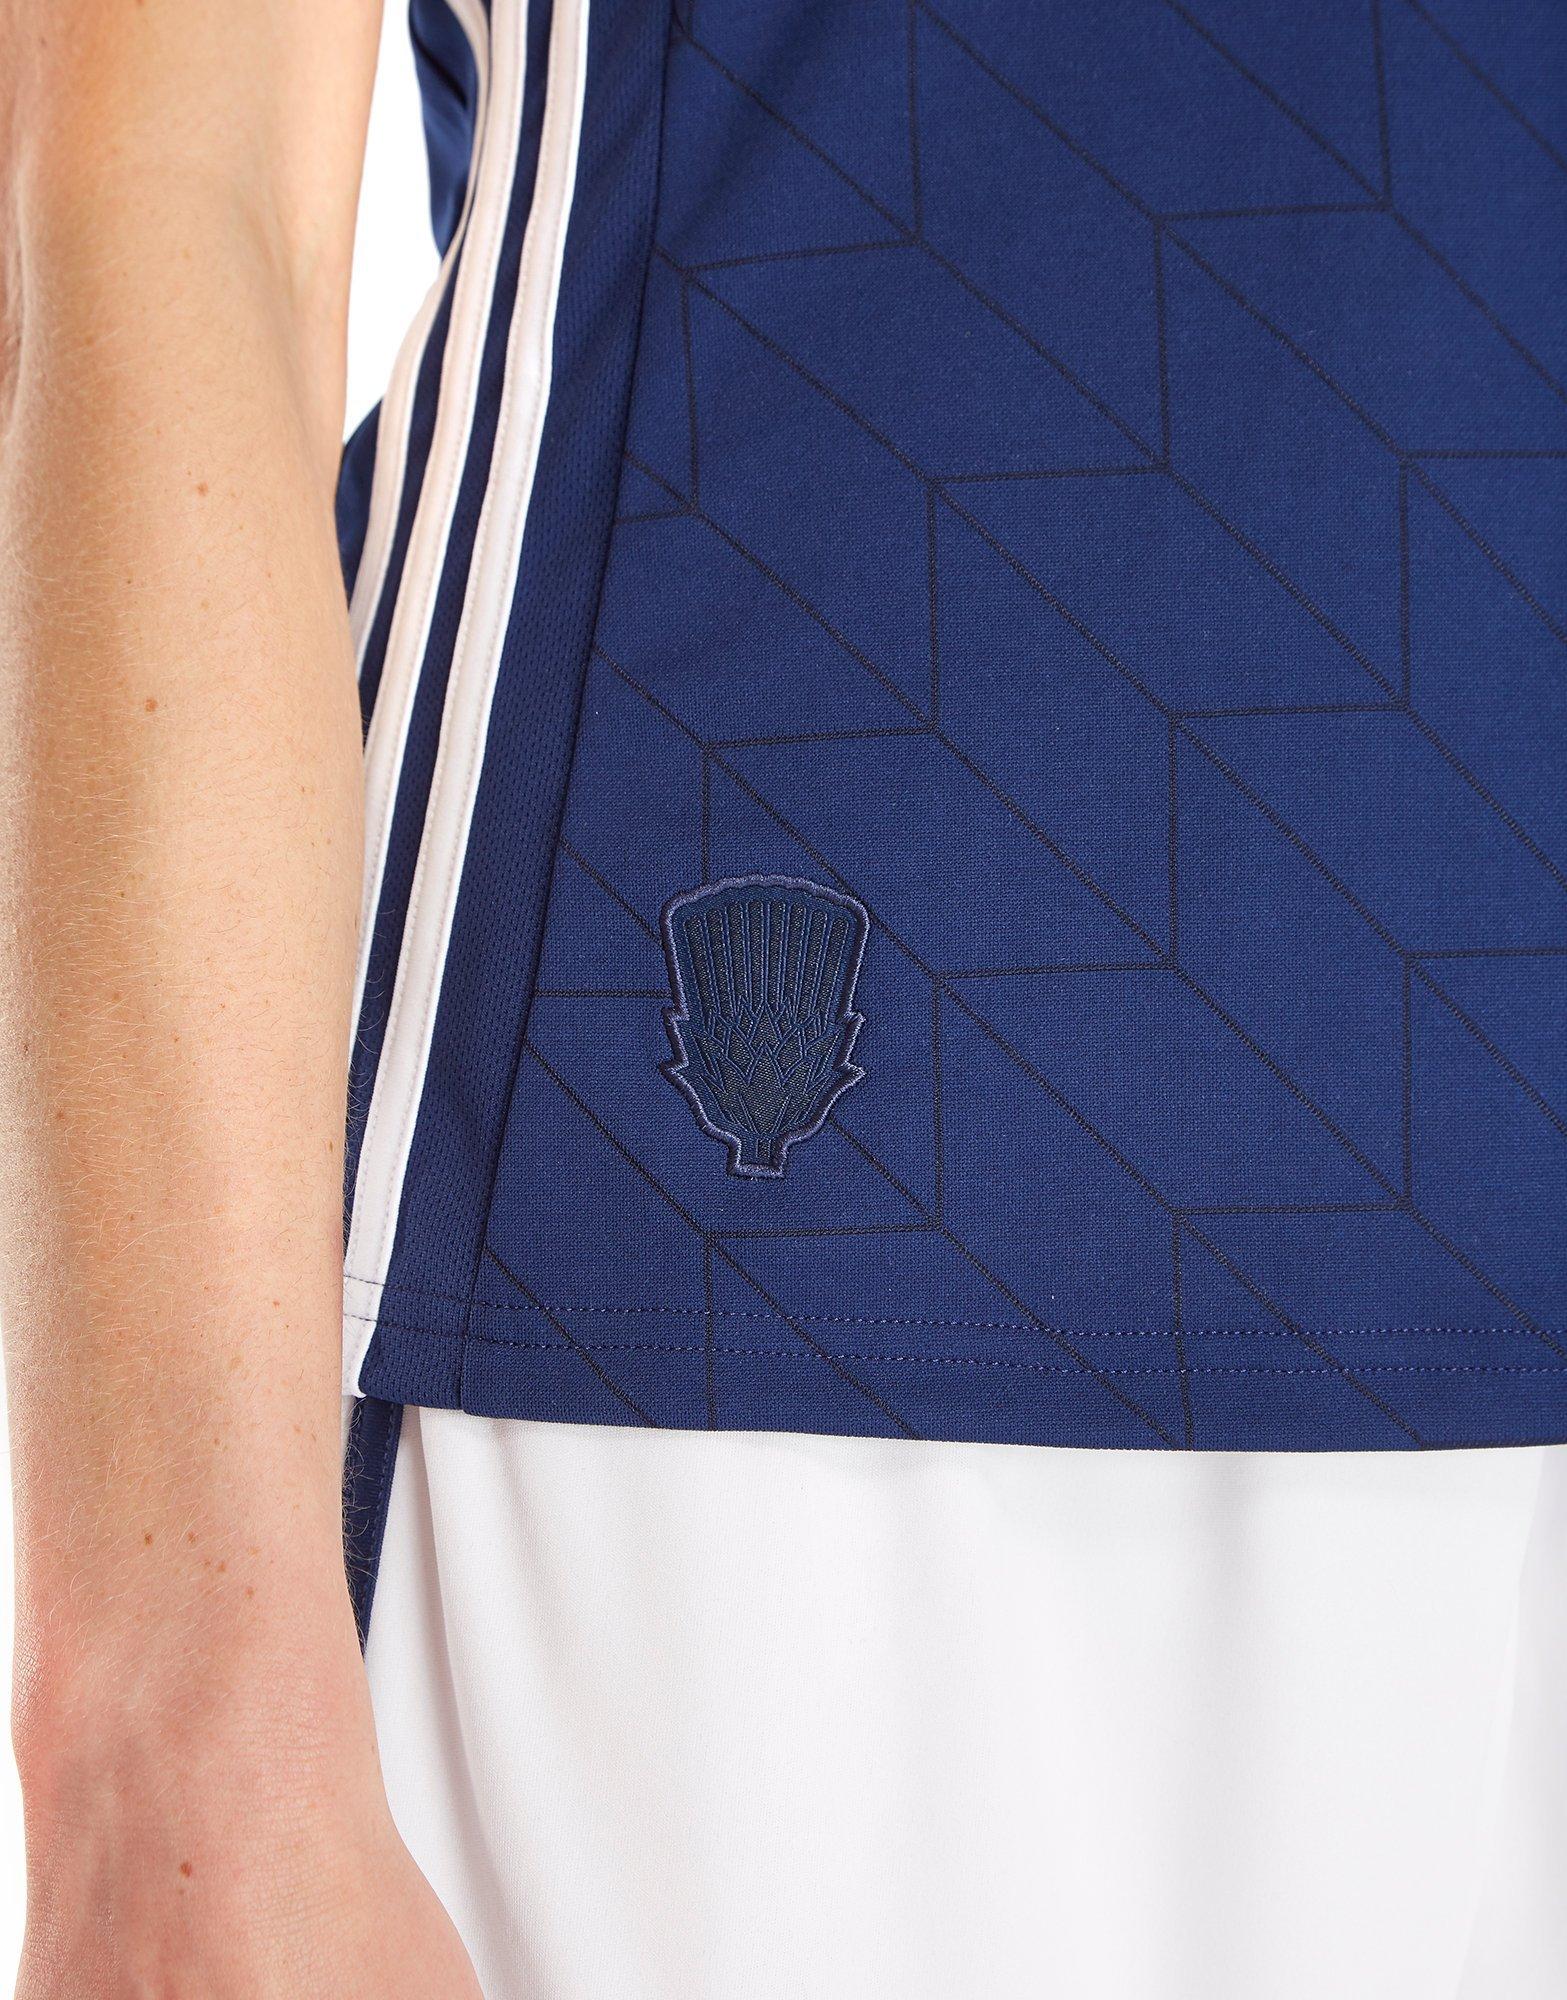 adidas Scotland 2018/19 Home Shirt Women's